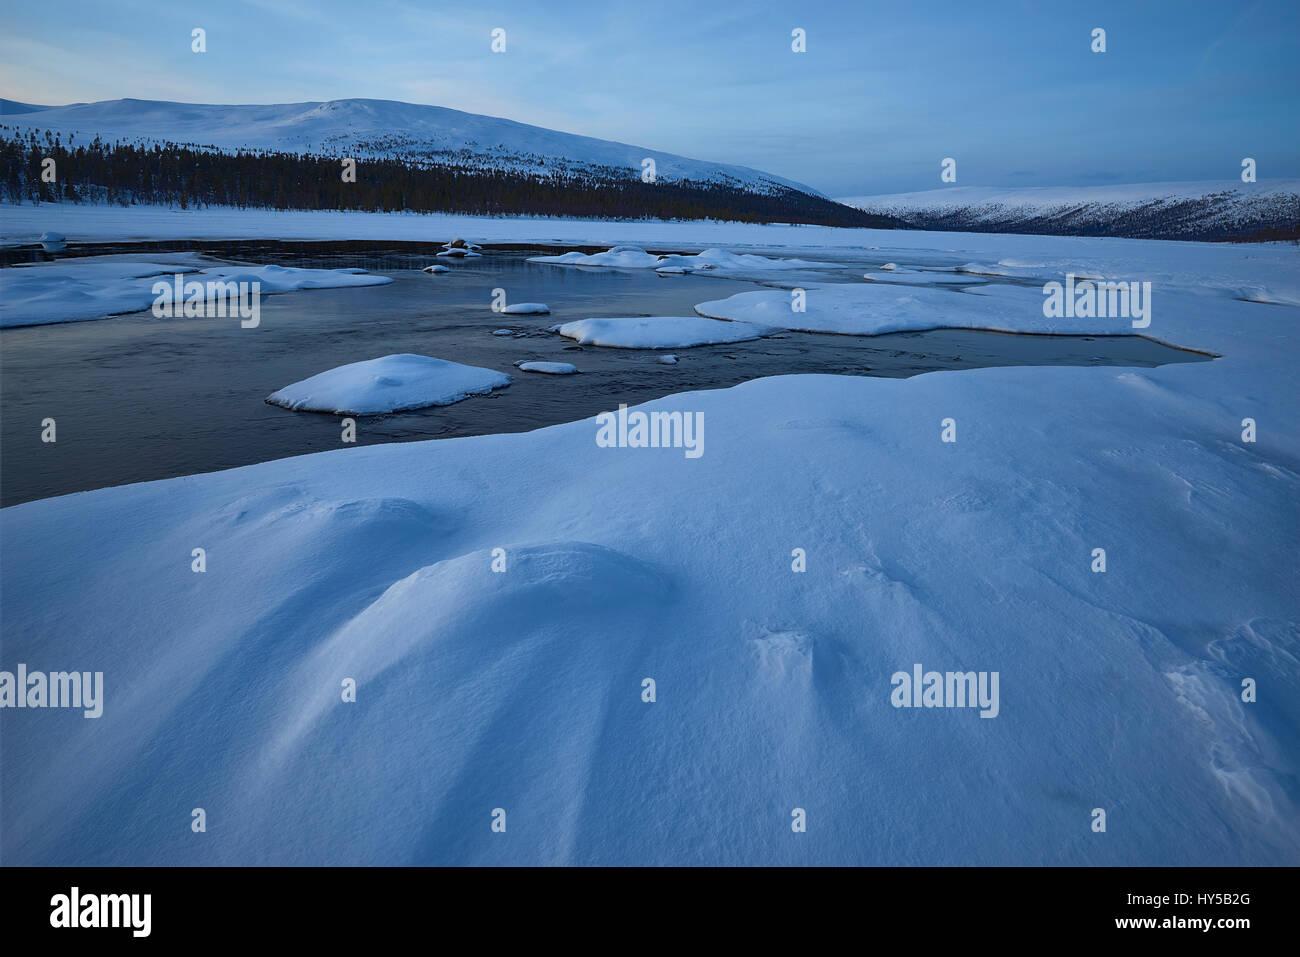 Sweden, Grovelsjon, Dalarna, Landscape with ice and snow - Stock Image